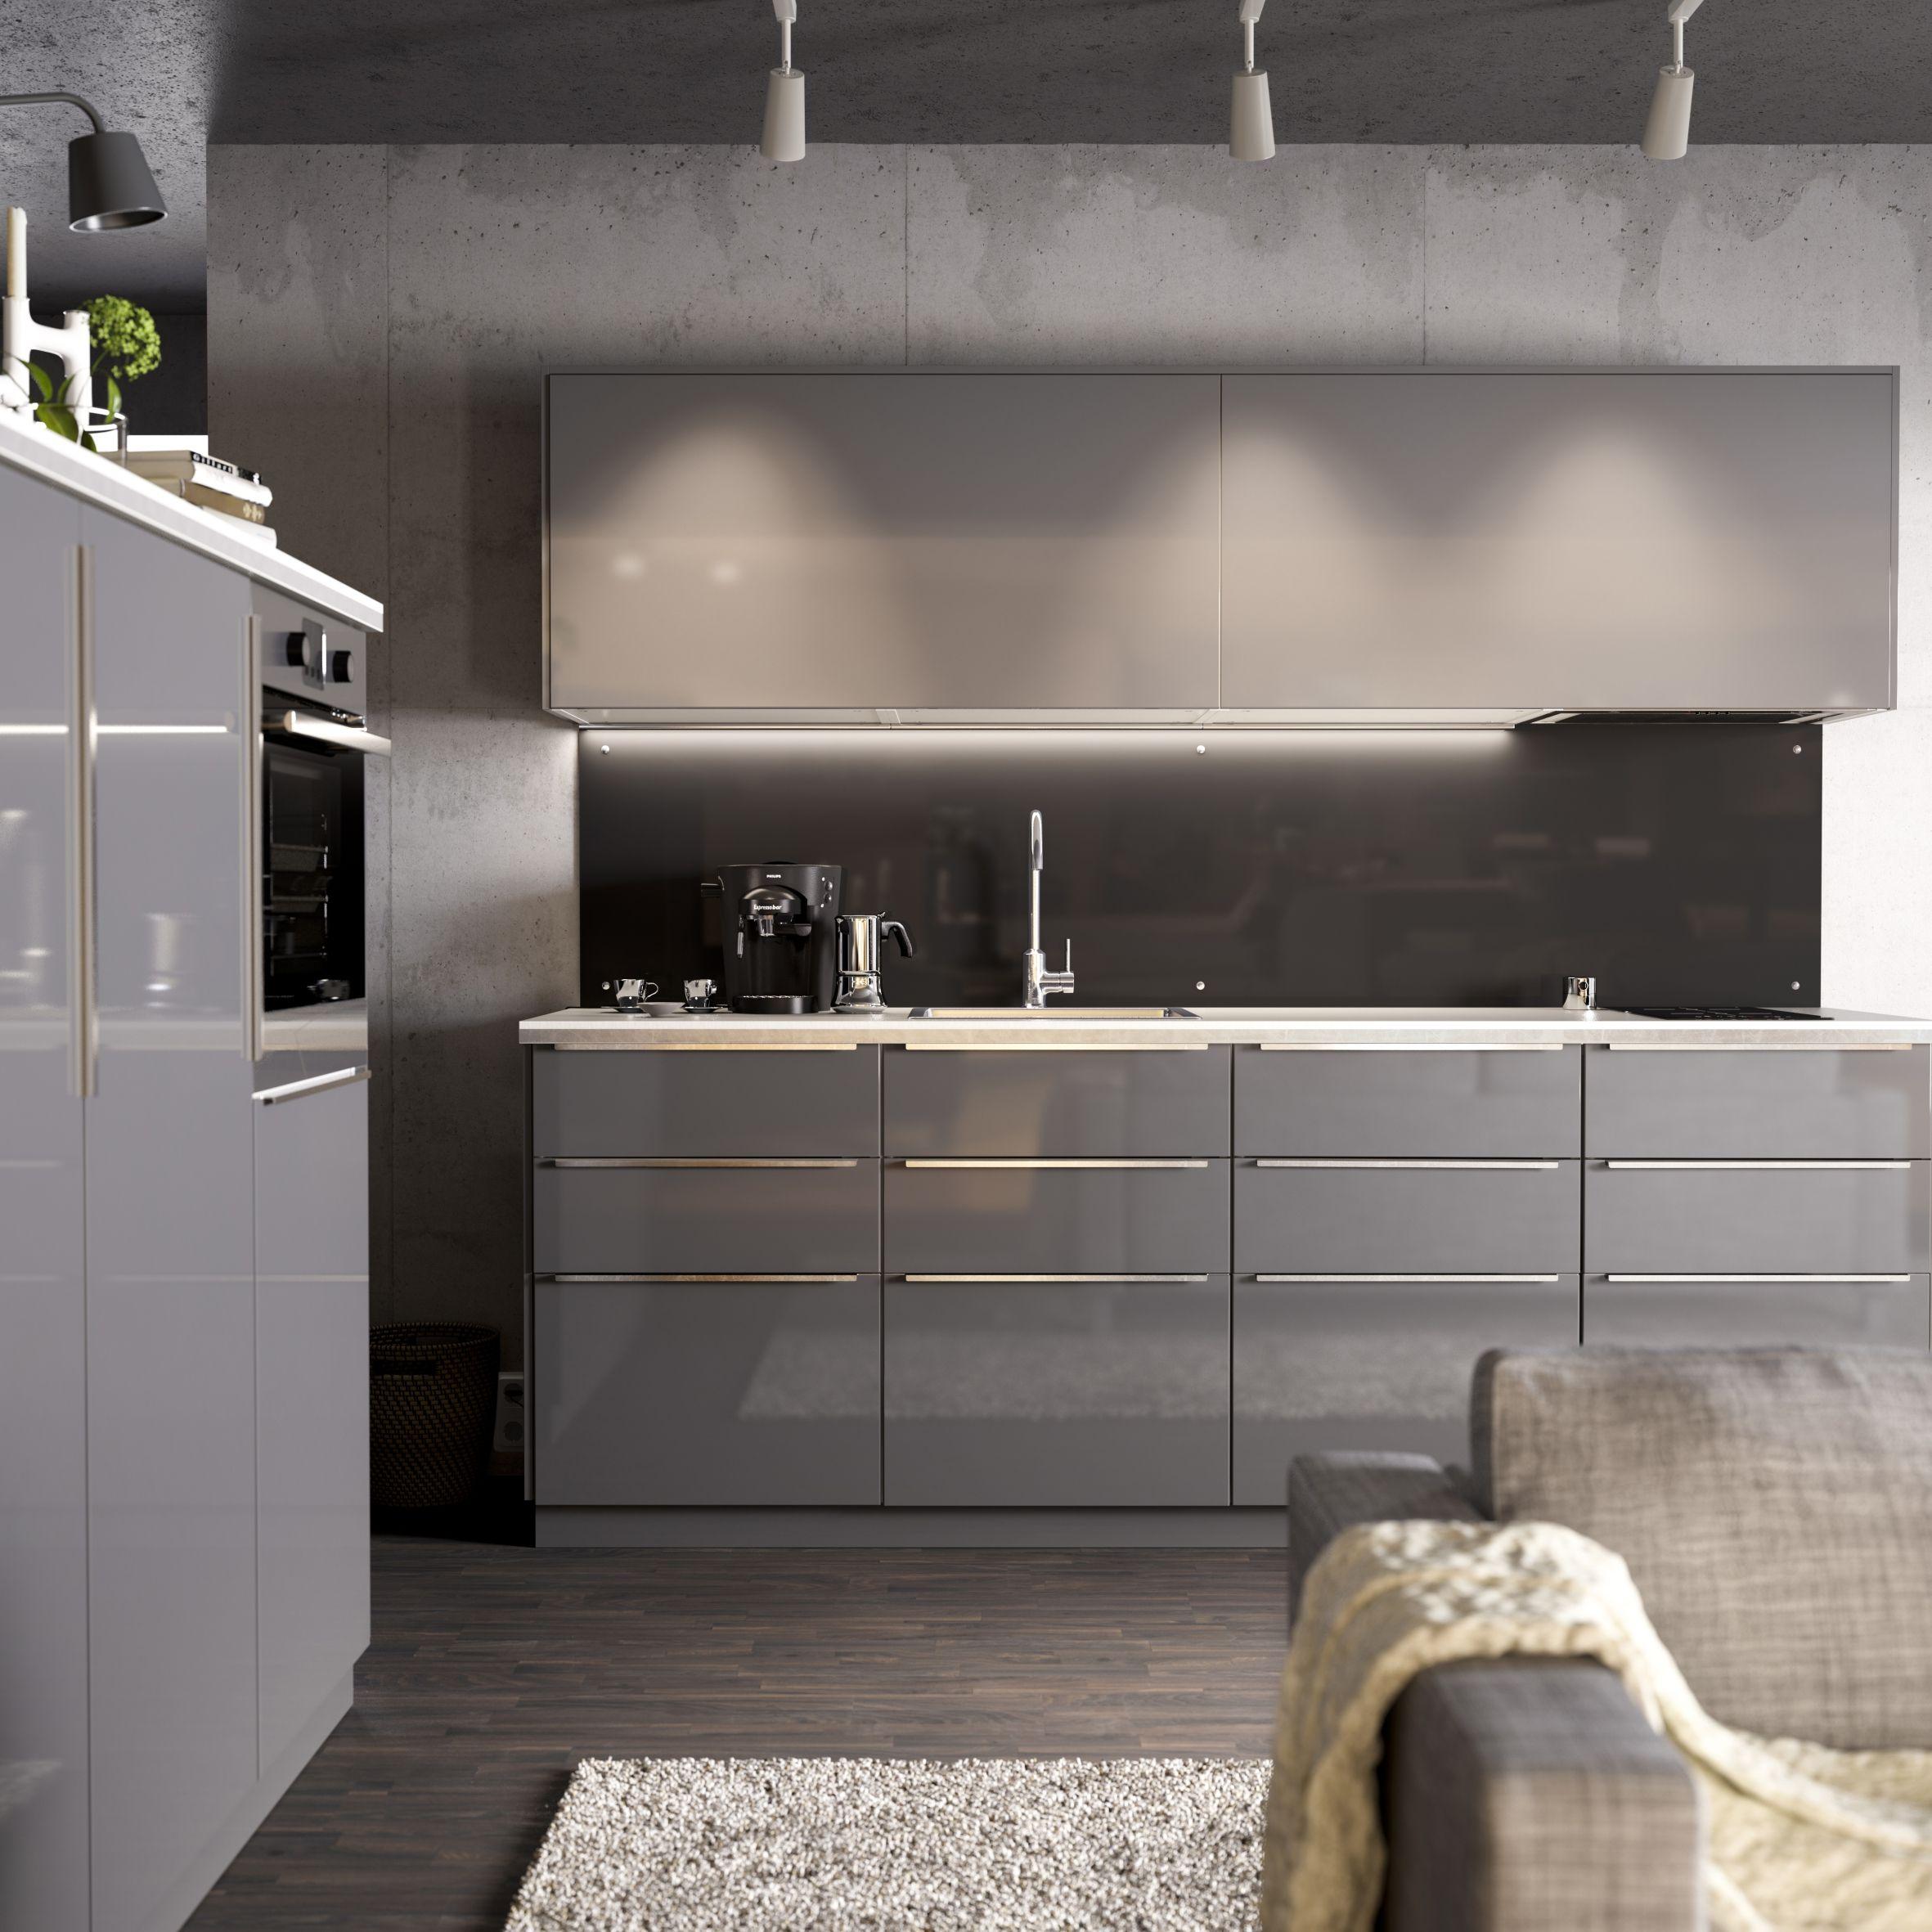 Kitchen #IKEAwin